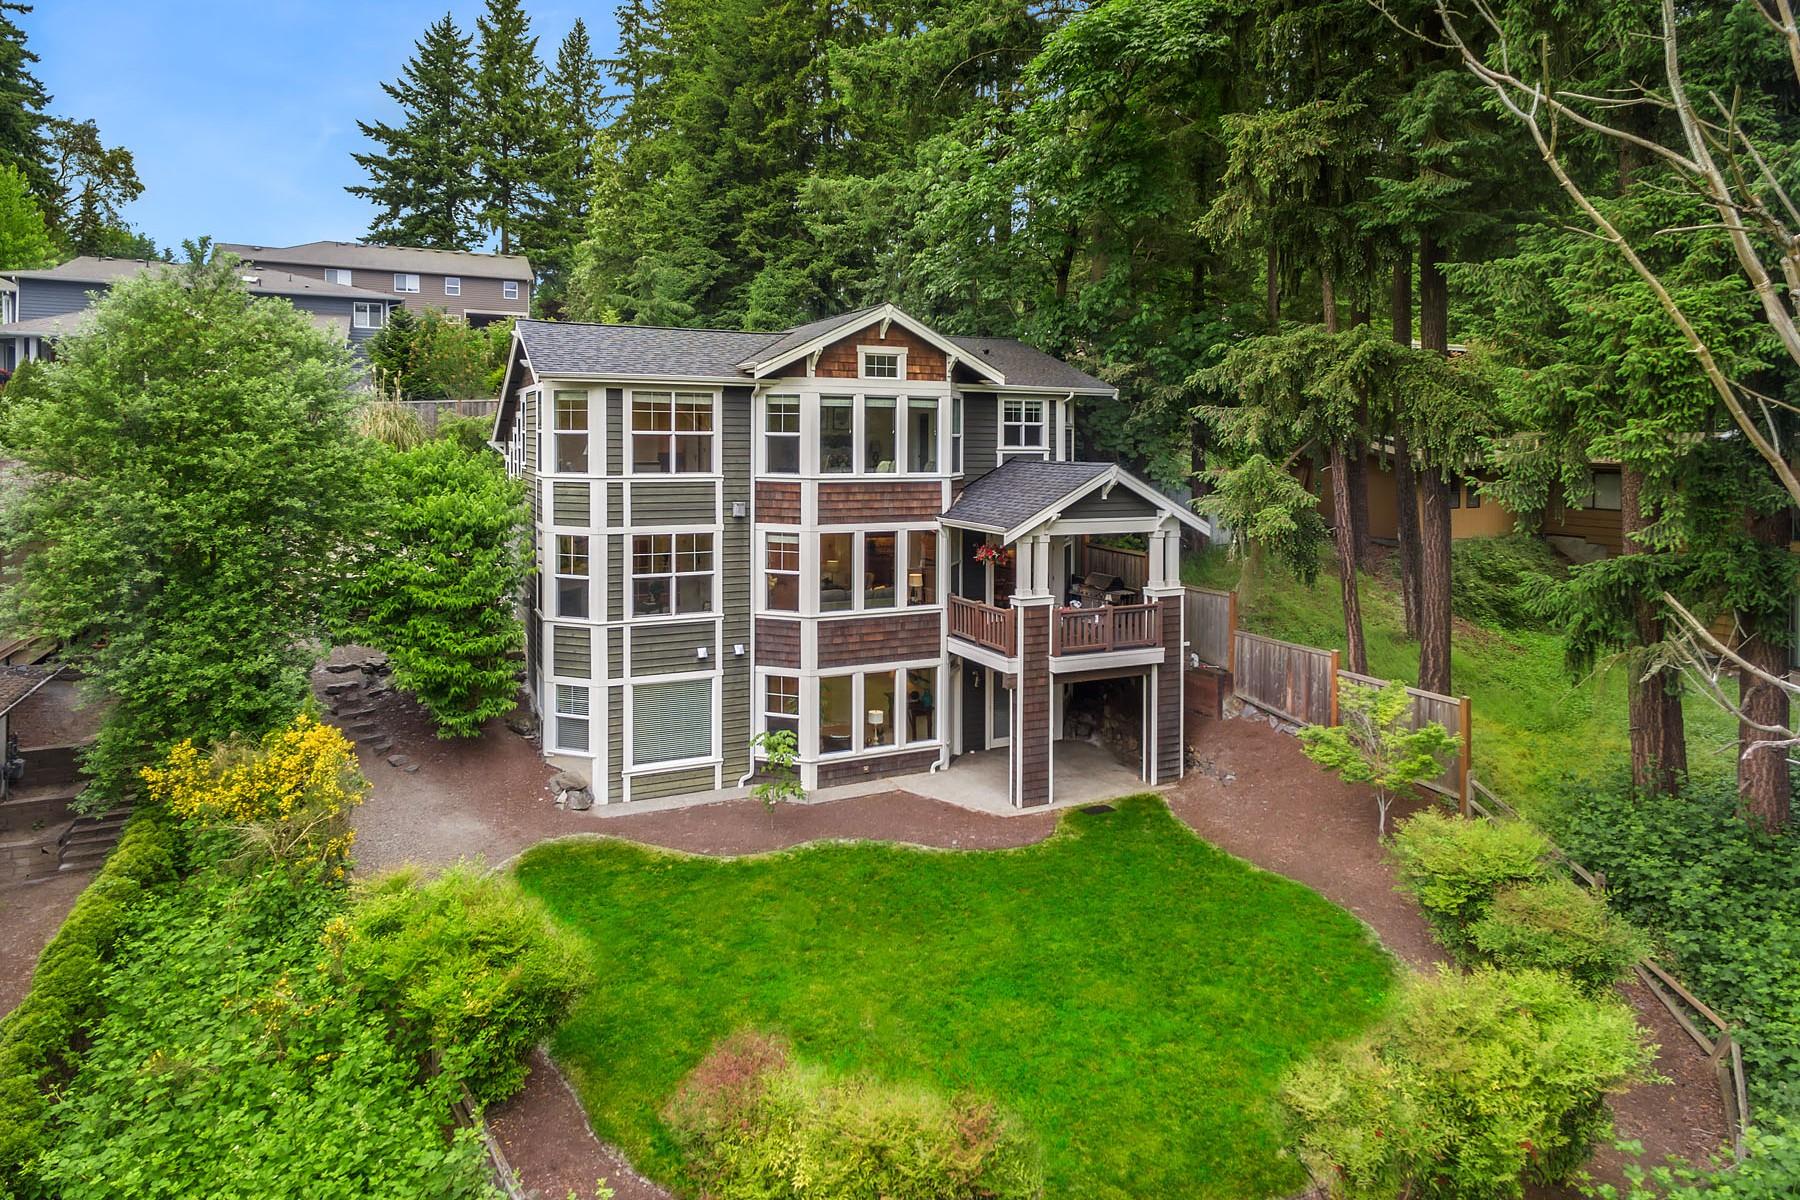 Single Family Home for Sale at Juanita Park 10816 103rd Ave NE Kirkland, Washington, 98033 United States